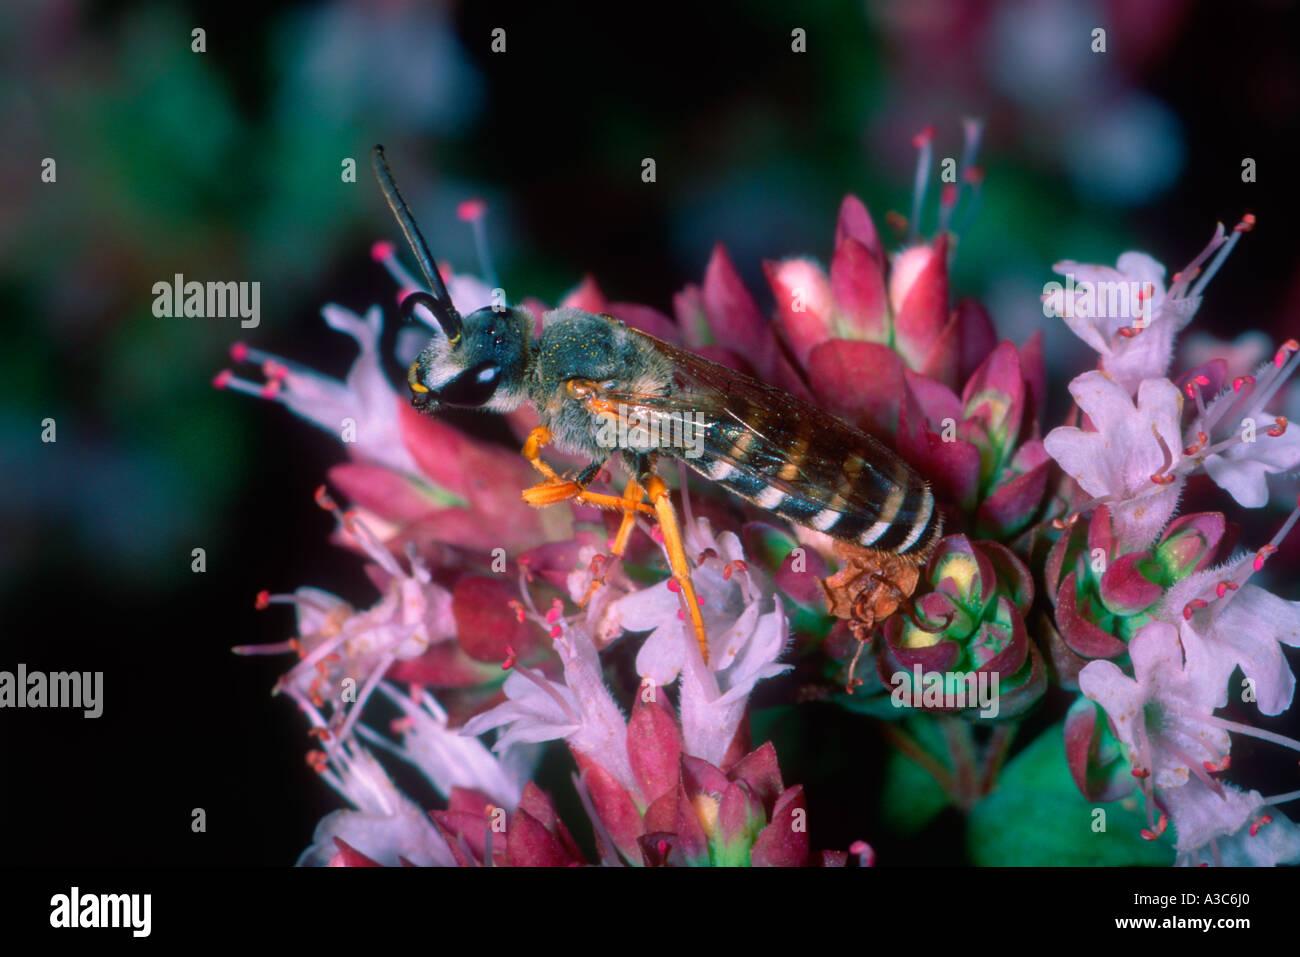 Bee, Family Halictidae. On flower - Stock Image